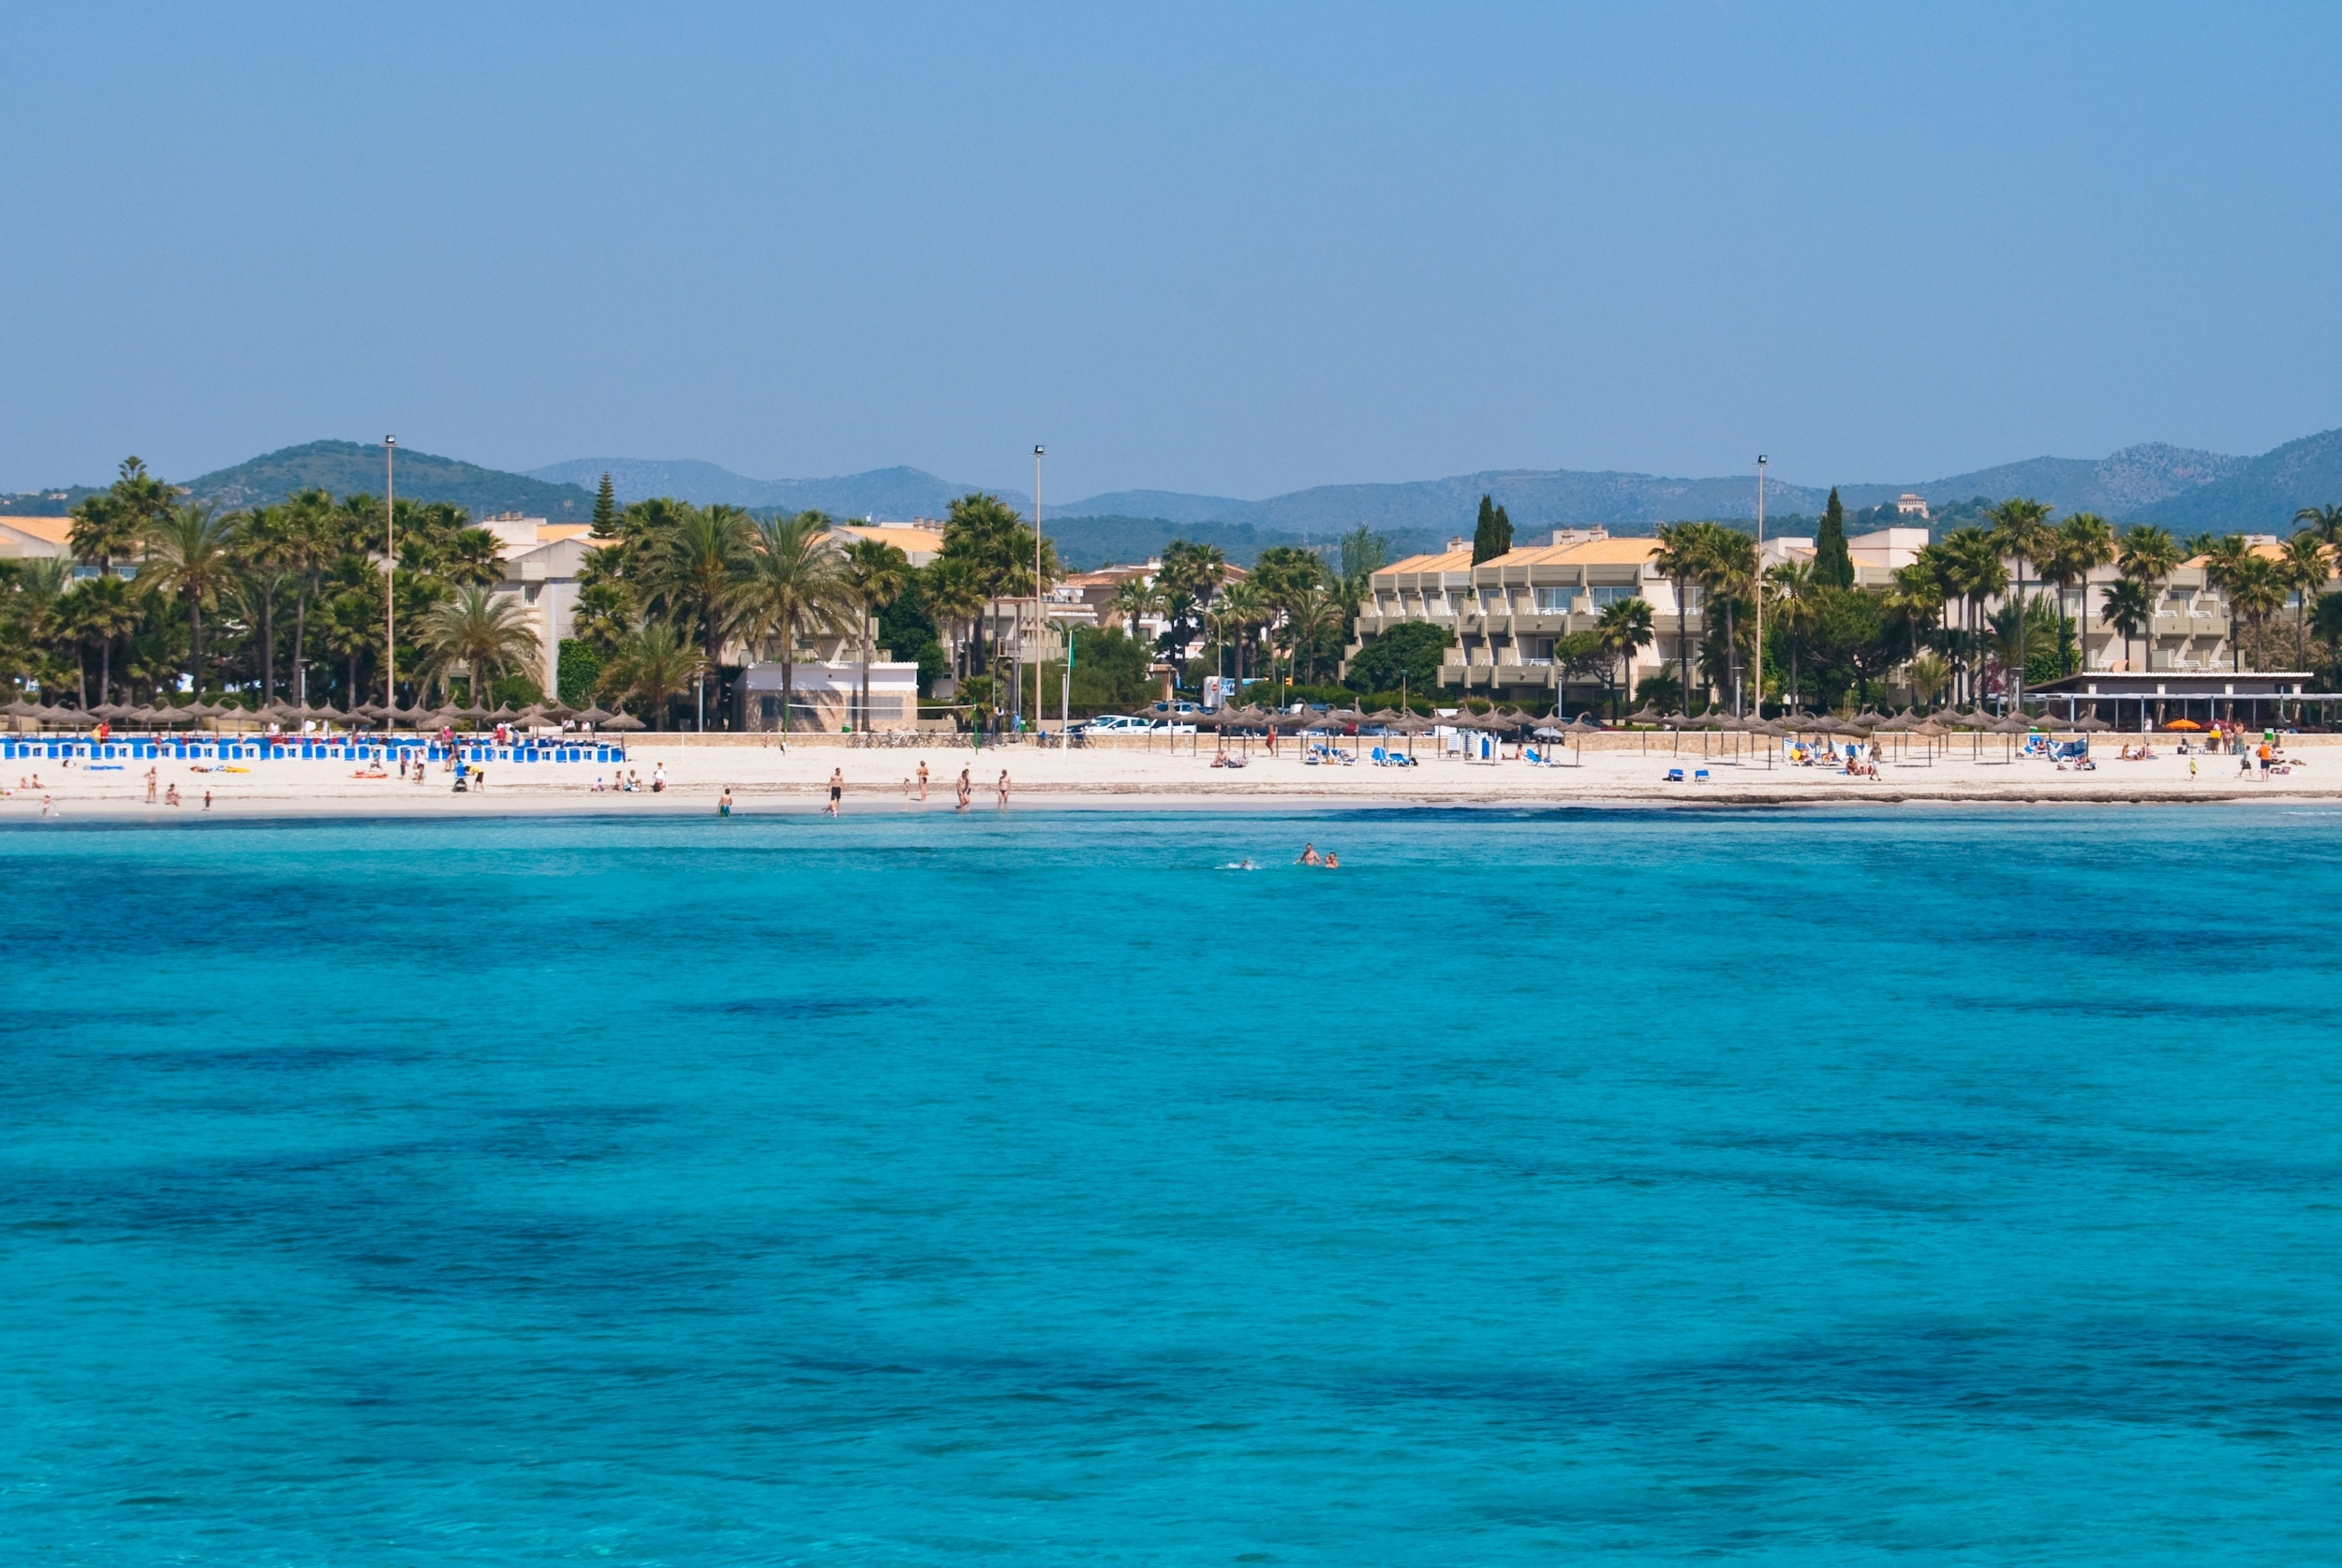 Sa Coma, Sant Llorenç des Cardassar, Islas Baleares, España